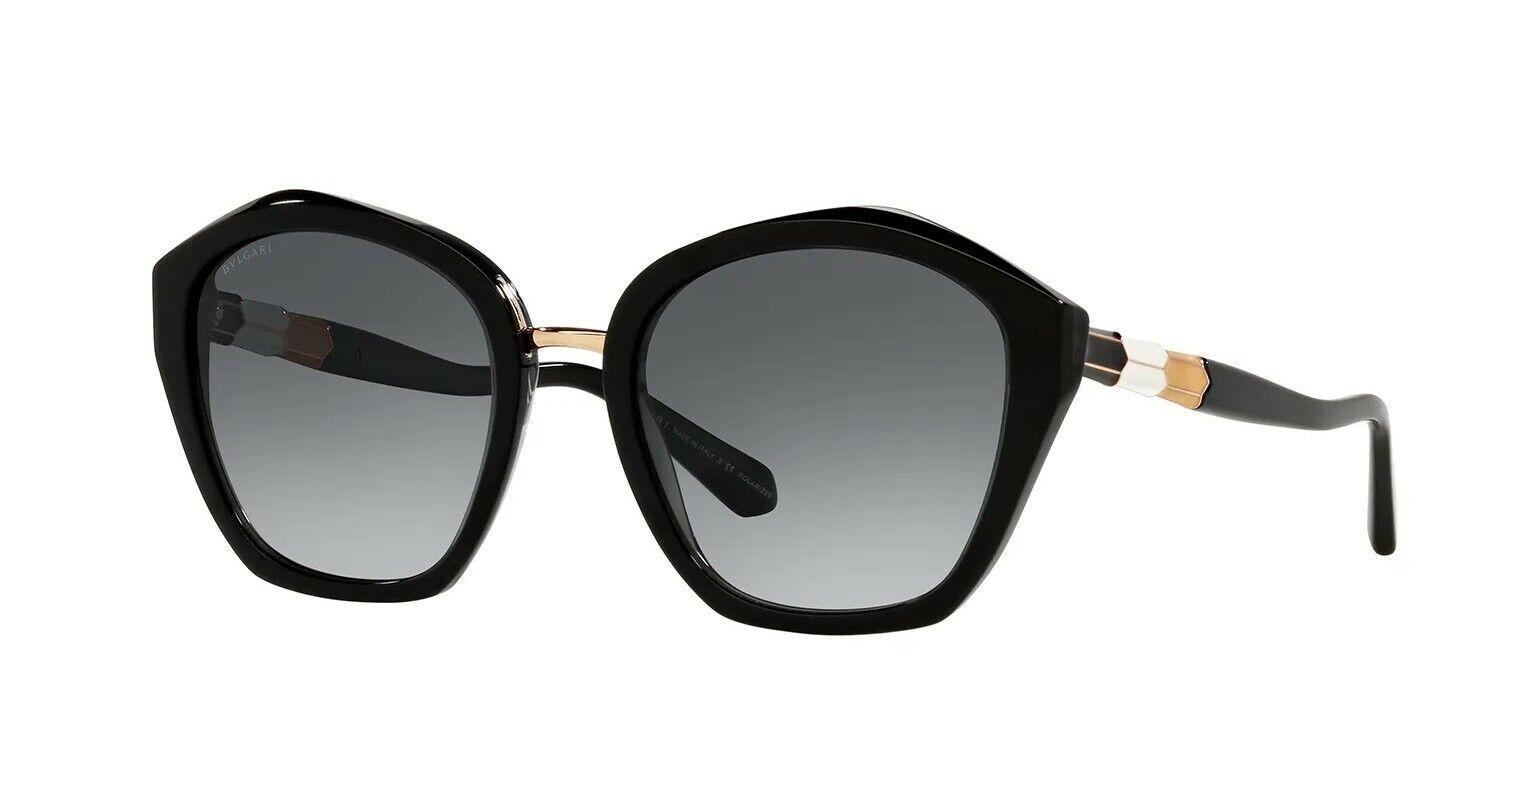 Bvlgari SERPENTI BV 8234 Black/Grey Shaded Polarized (5381/T3) Sunglasses